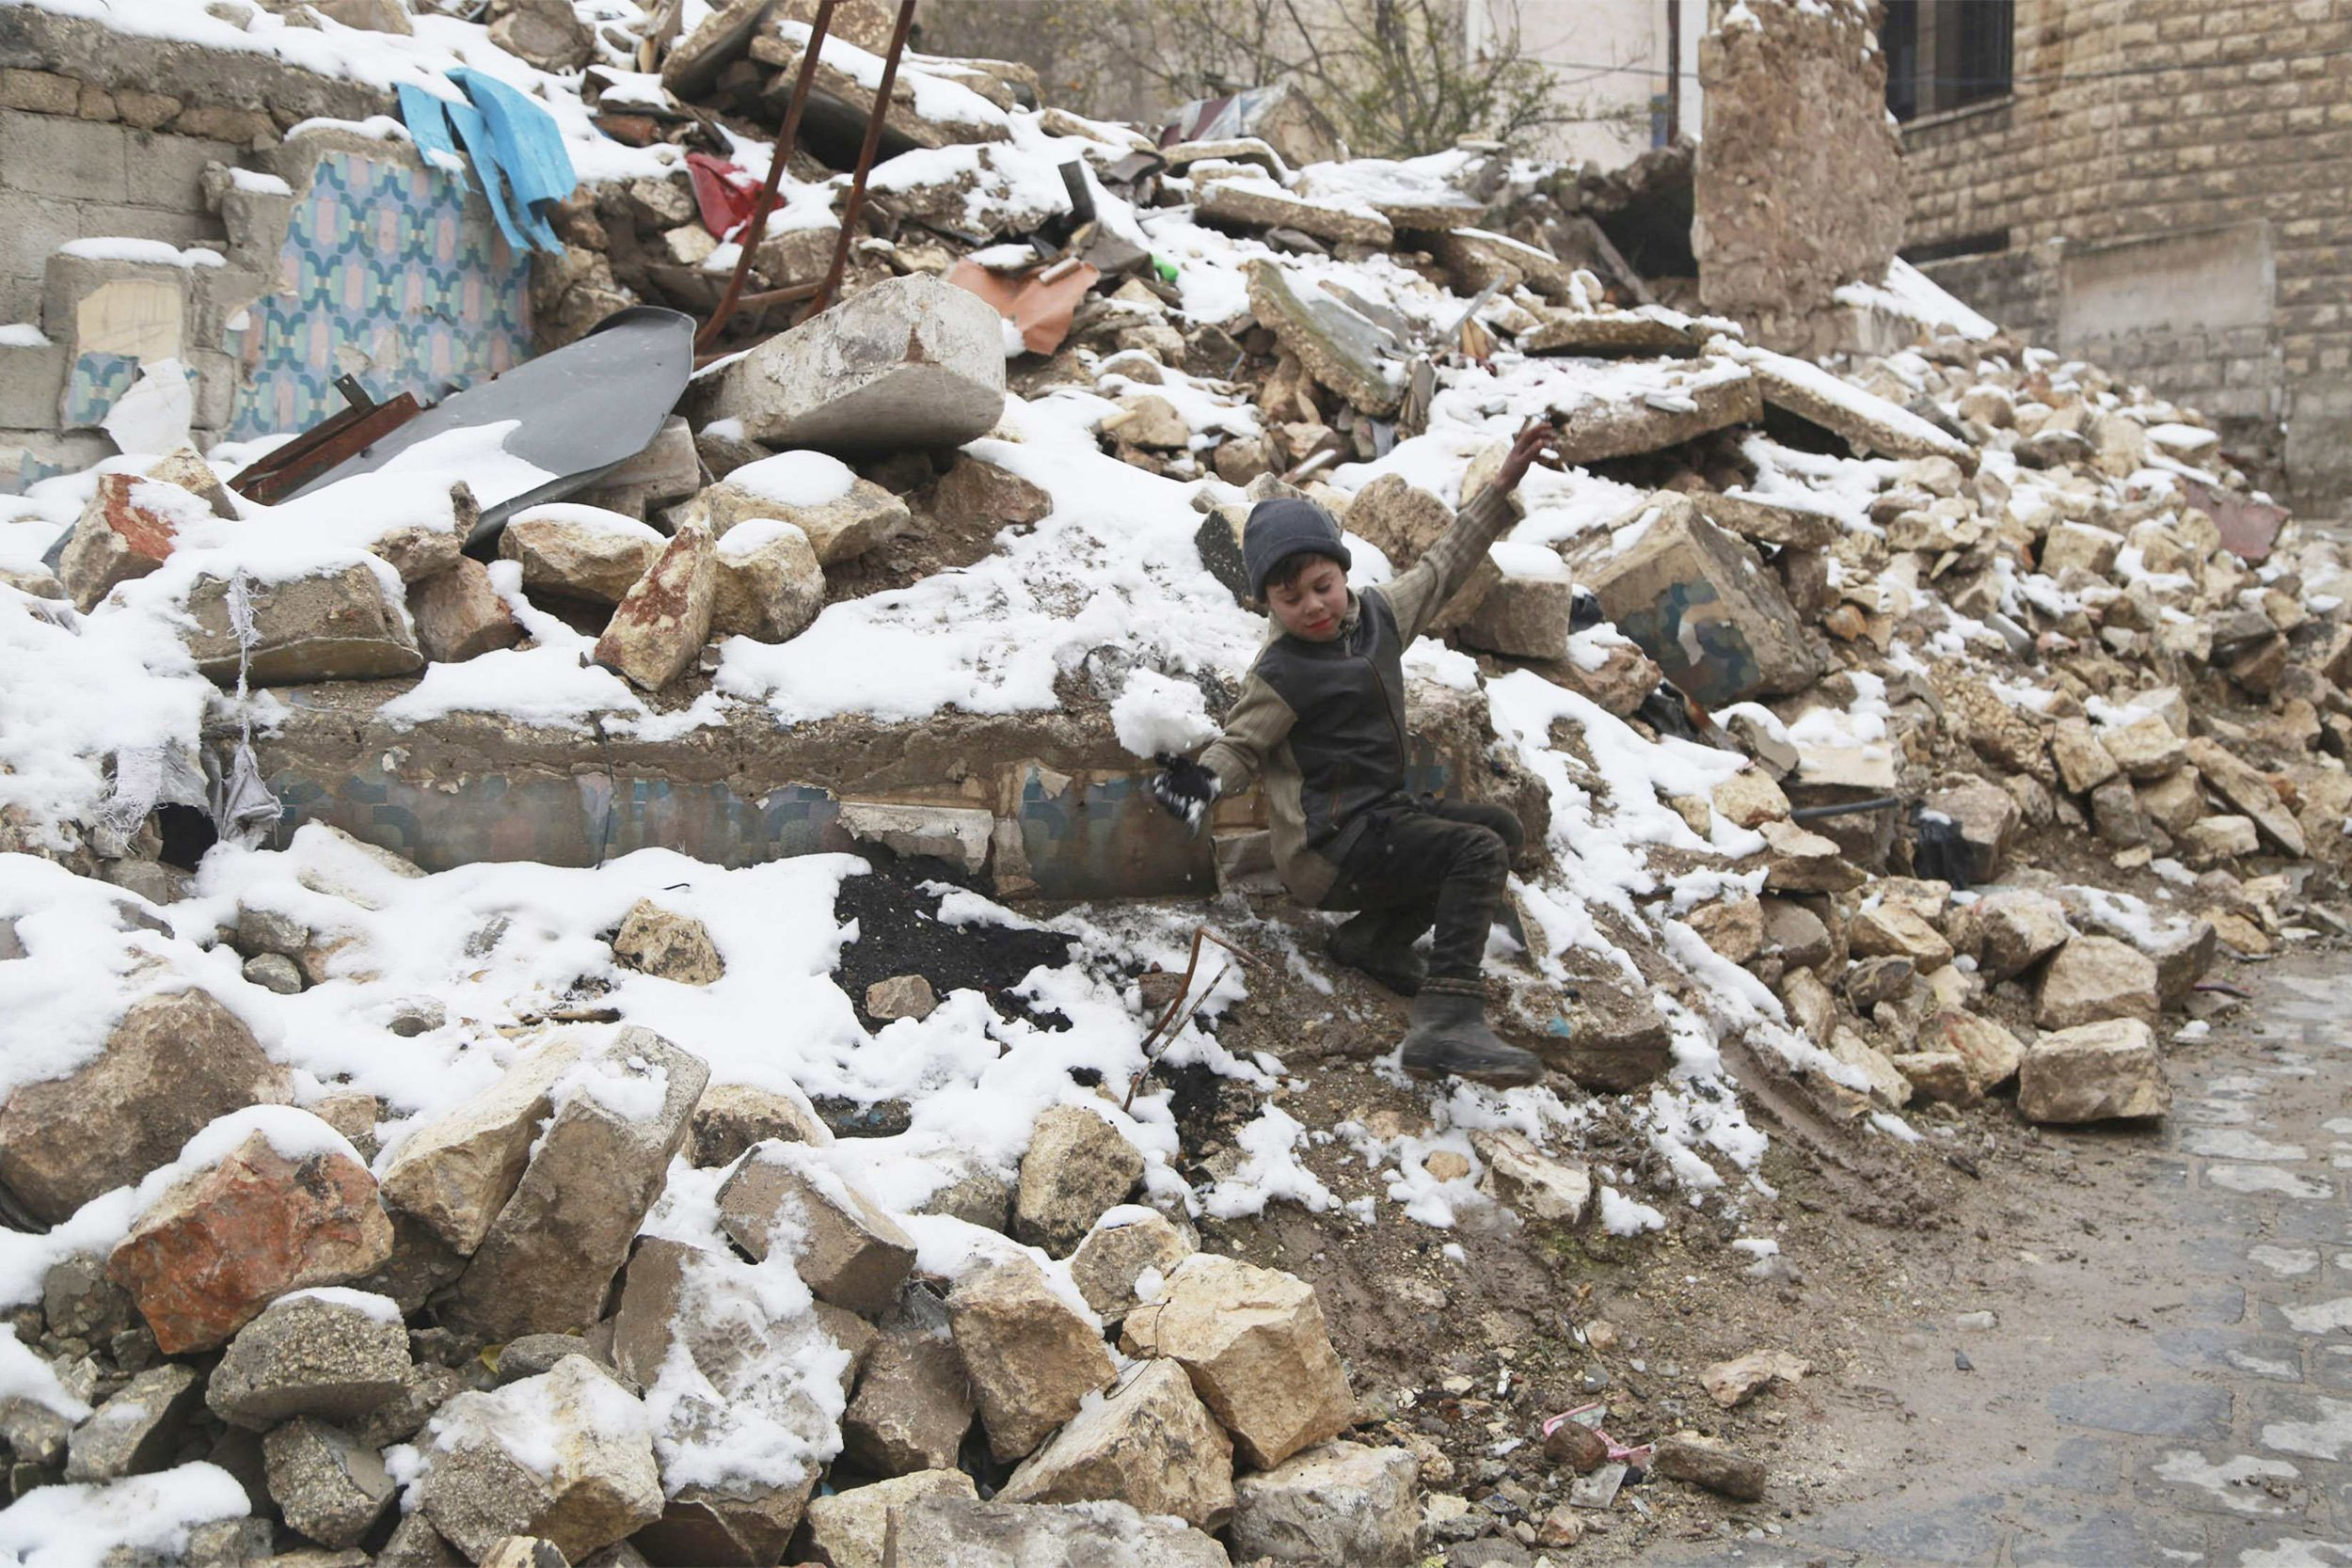 2015-01-12T162952Z_1348559358_GM1EB1D01AU01_RTRMADP_3_SYRIA-CRISIS